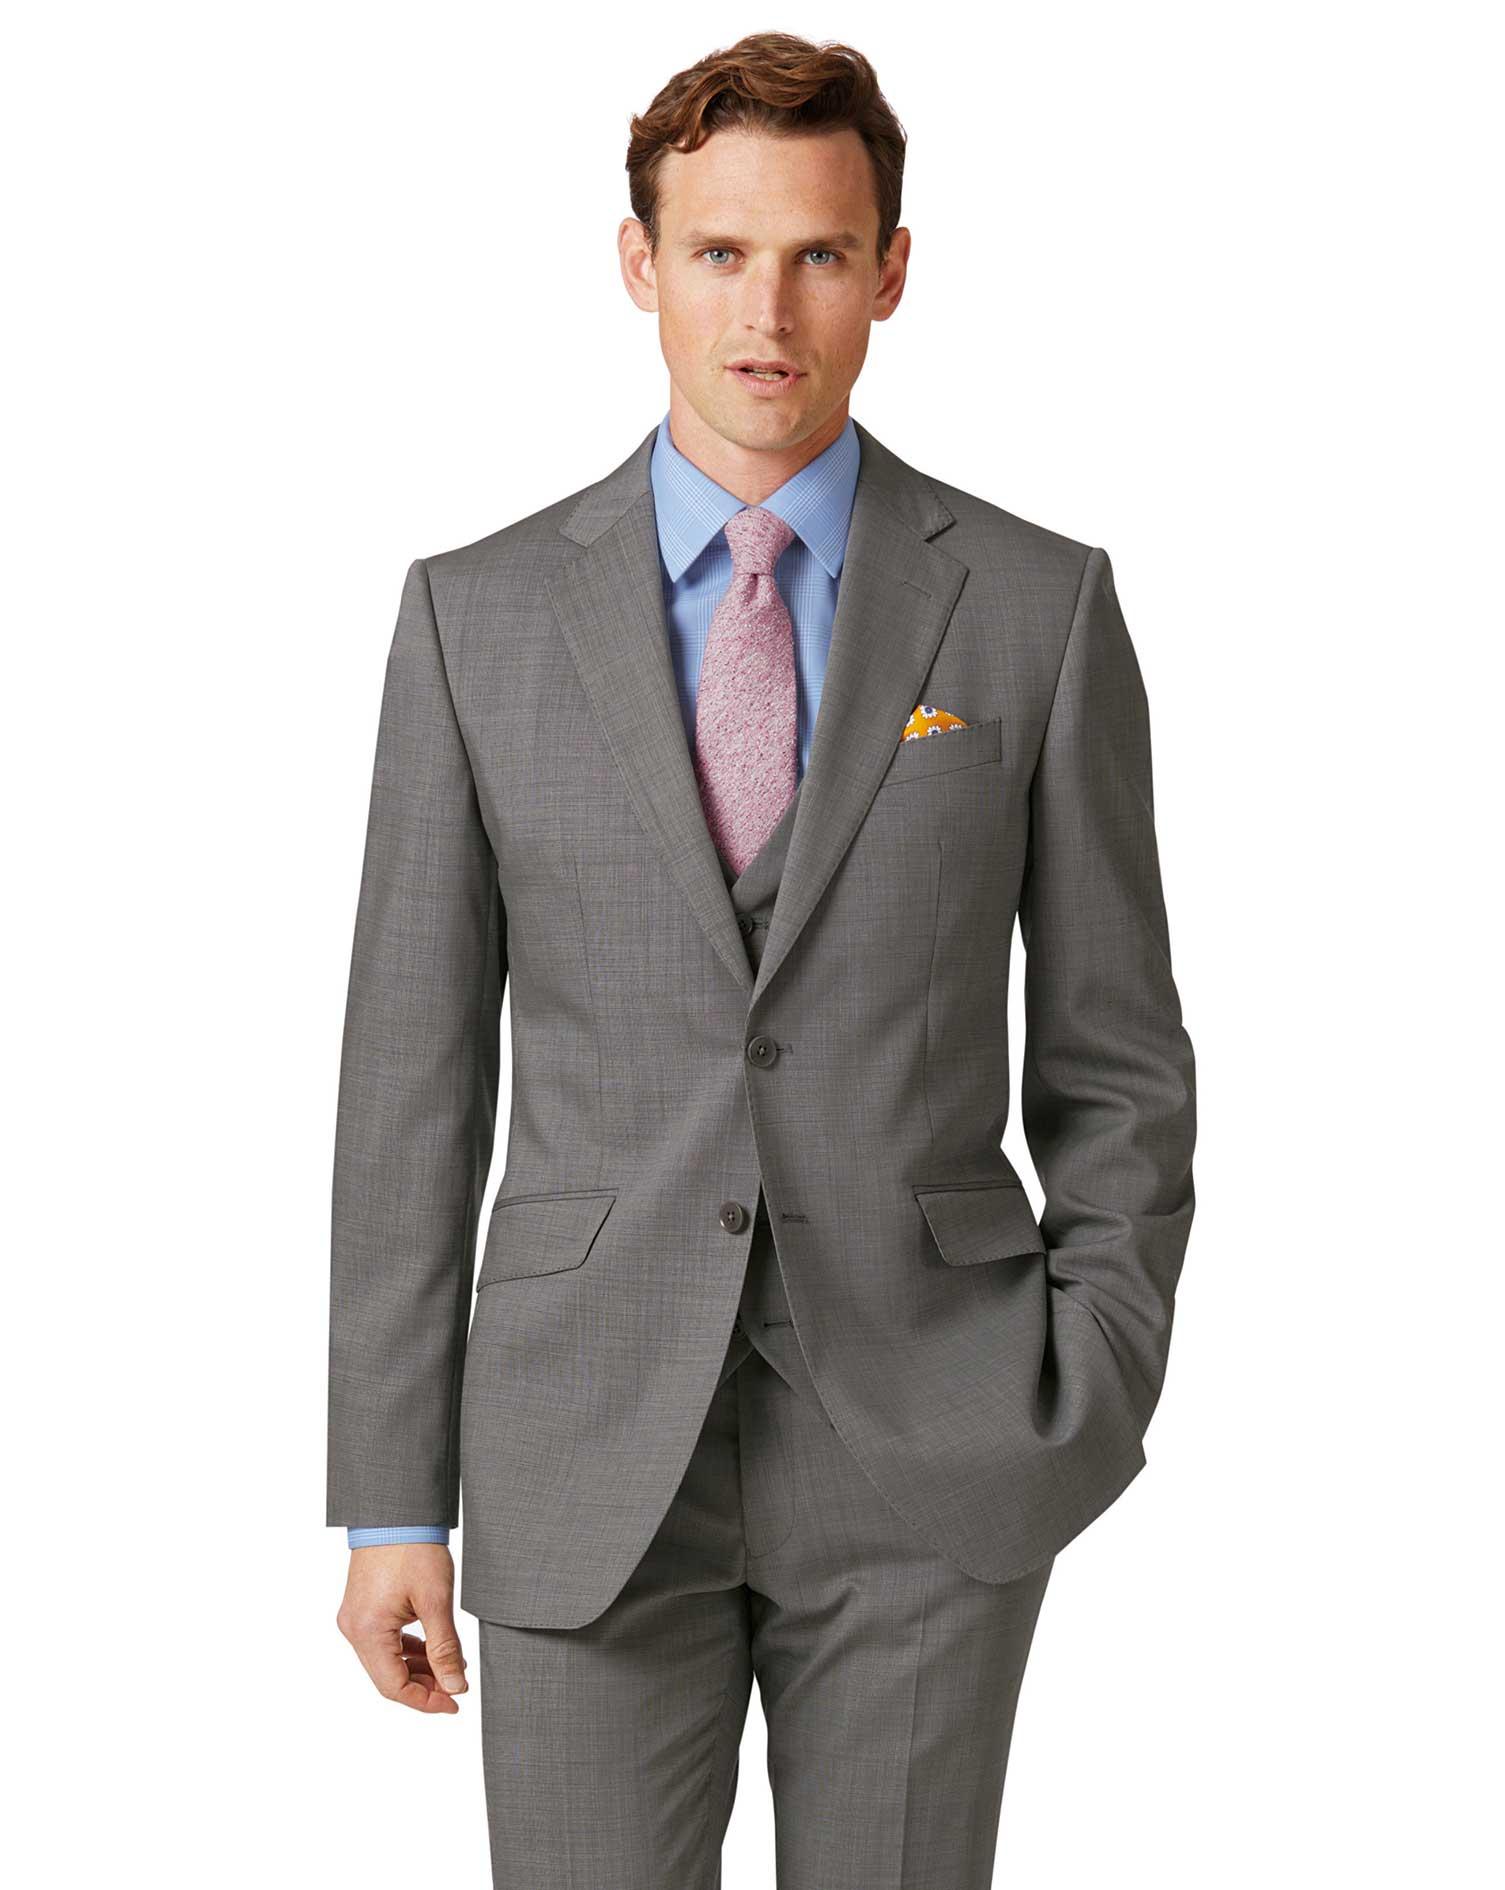 Silver Slim Fit Step Weave Suit Wool Jacket Size 36 Regular by Charles Tyrwhitt